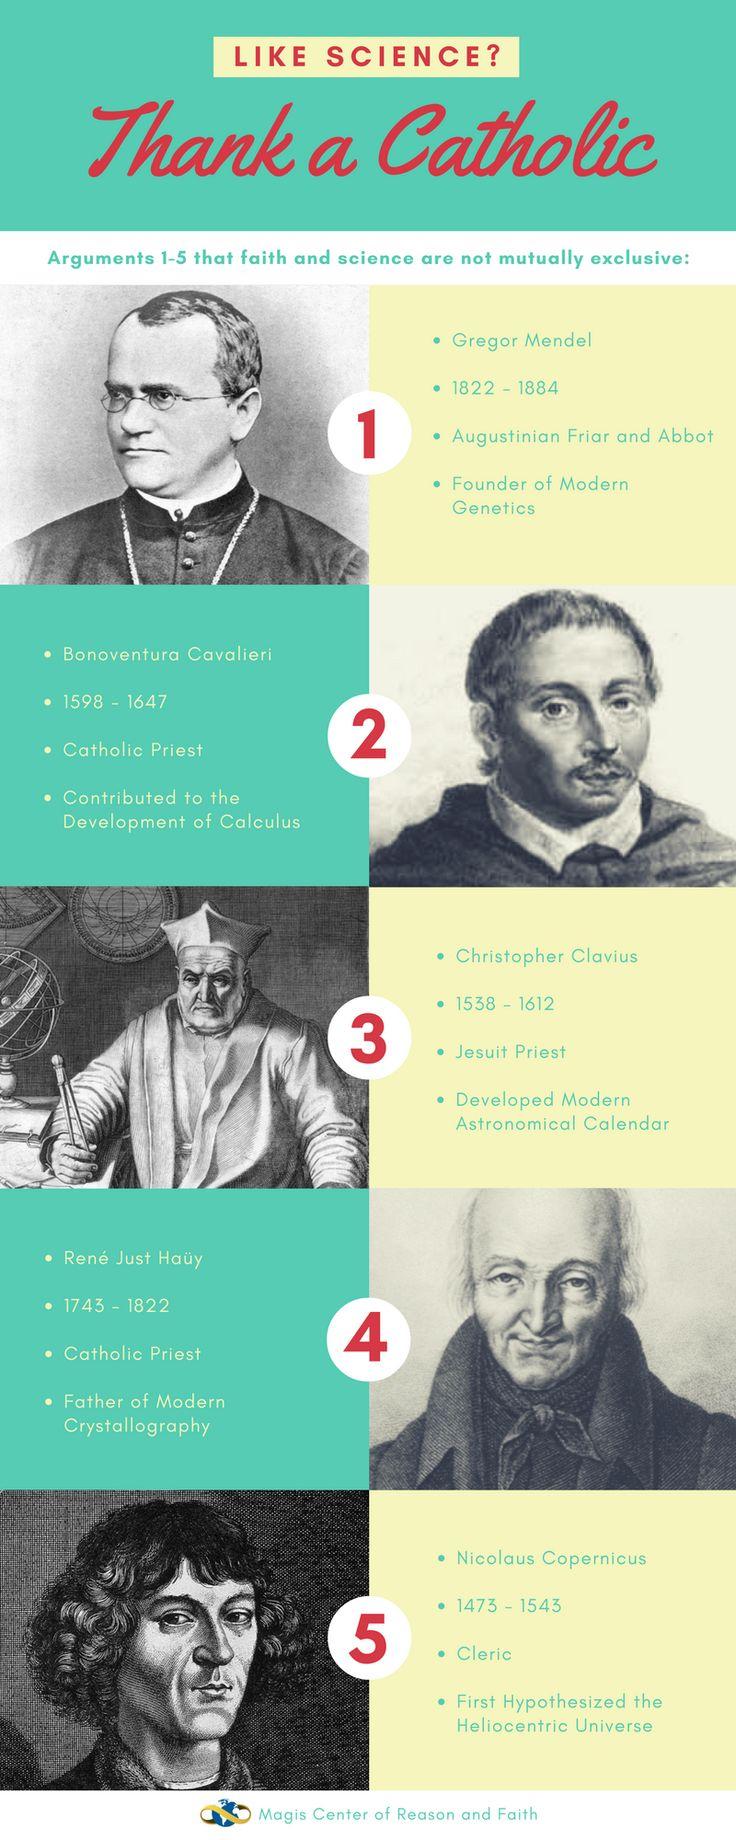 Faith & Reason Infographic Series #1-5. Gregor Mendel, Bonoventura Cavalieri, Christopher Clavius, René Just Haüy, Nicolaus Copernicus.